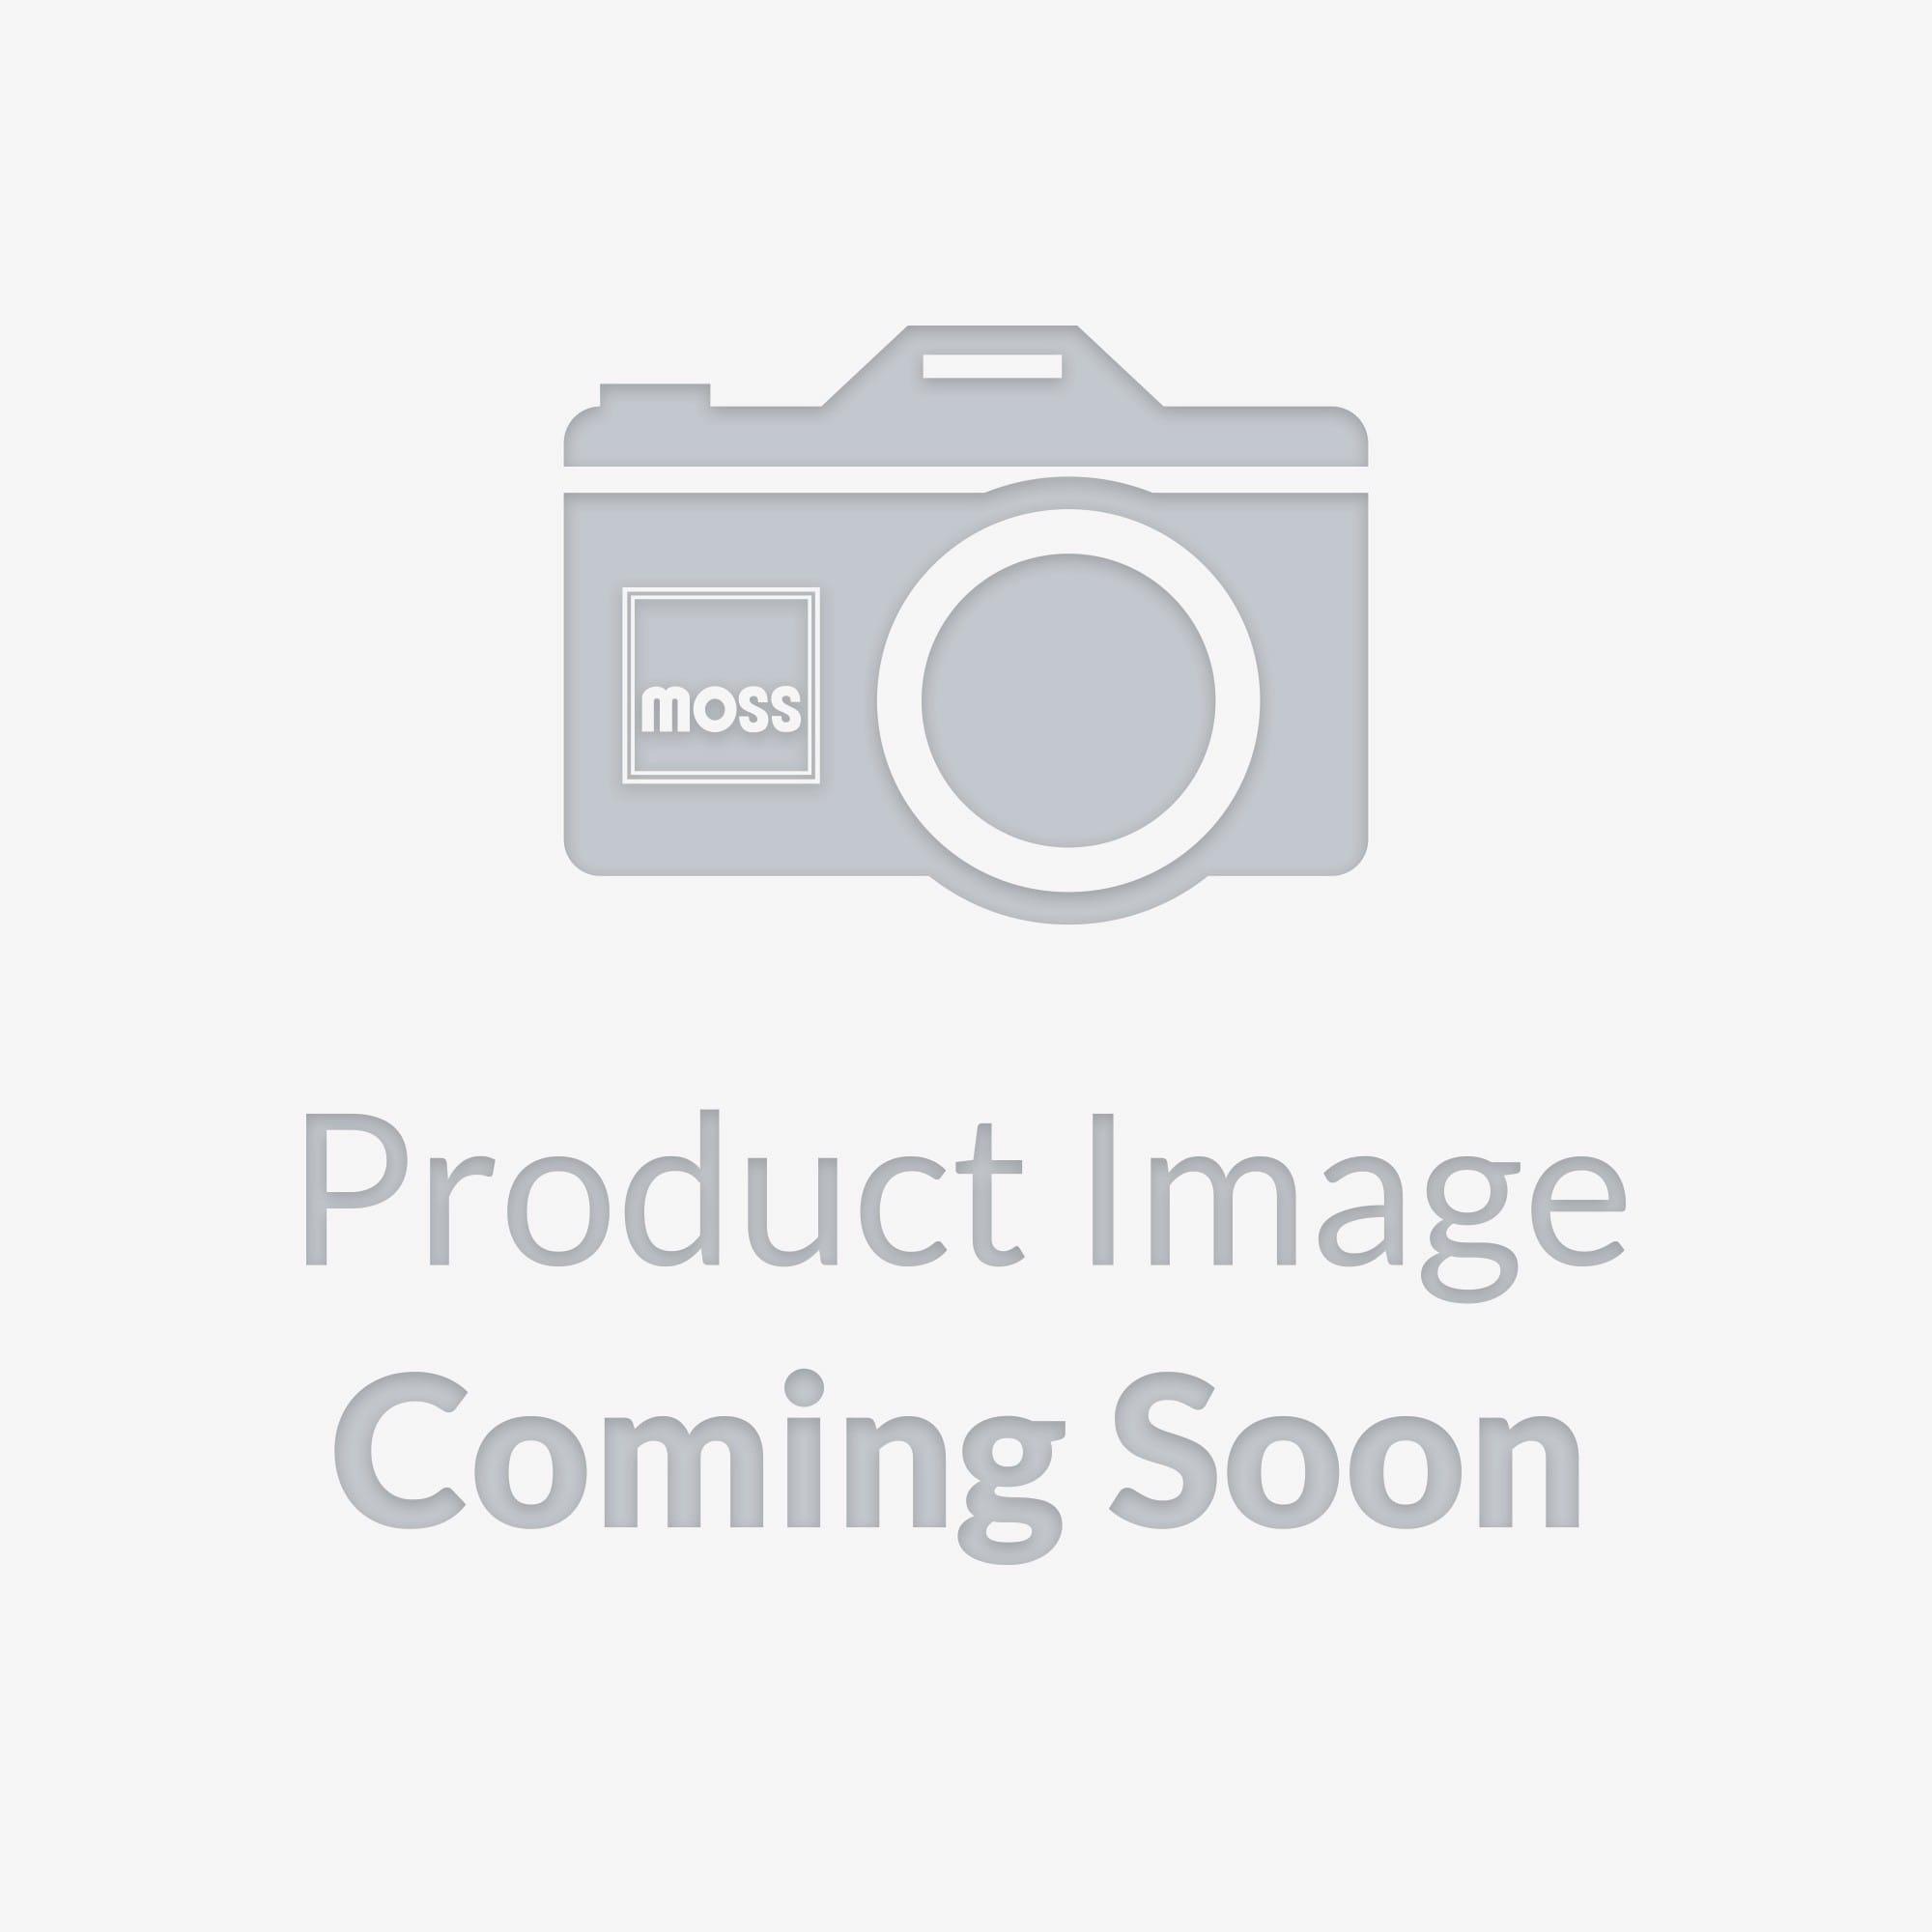 Mikuni Phh Manual Eb15d Coleman Evcon Wiring Diagram Array 366 380 Carburetor Conversion Kit Moss Motors Rh Mossmotors Com